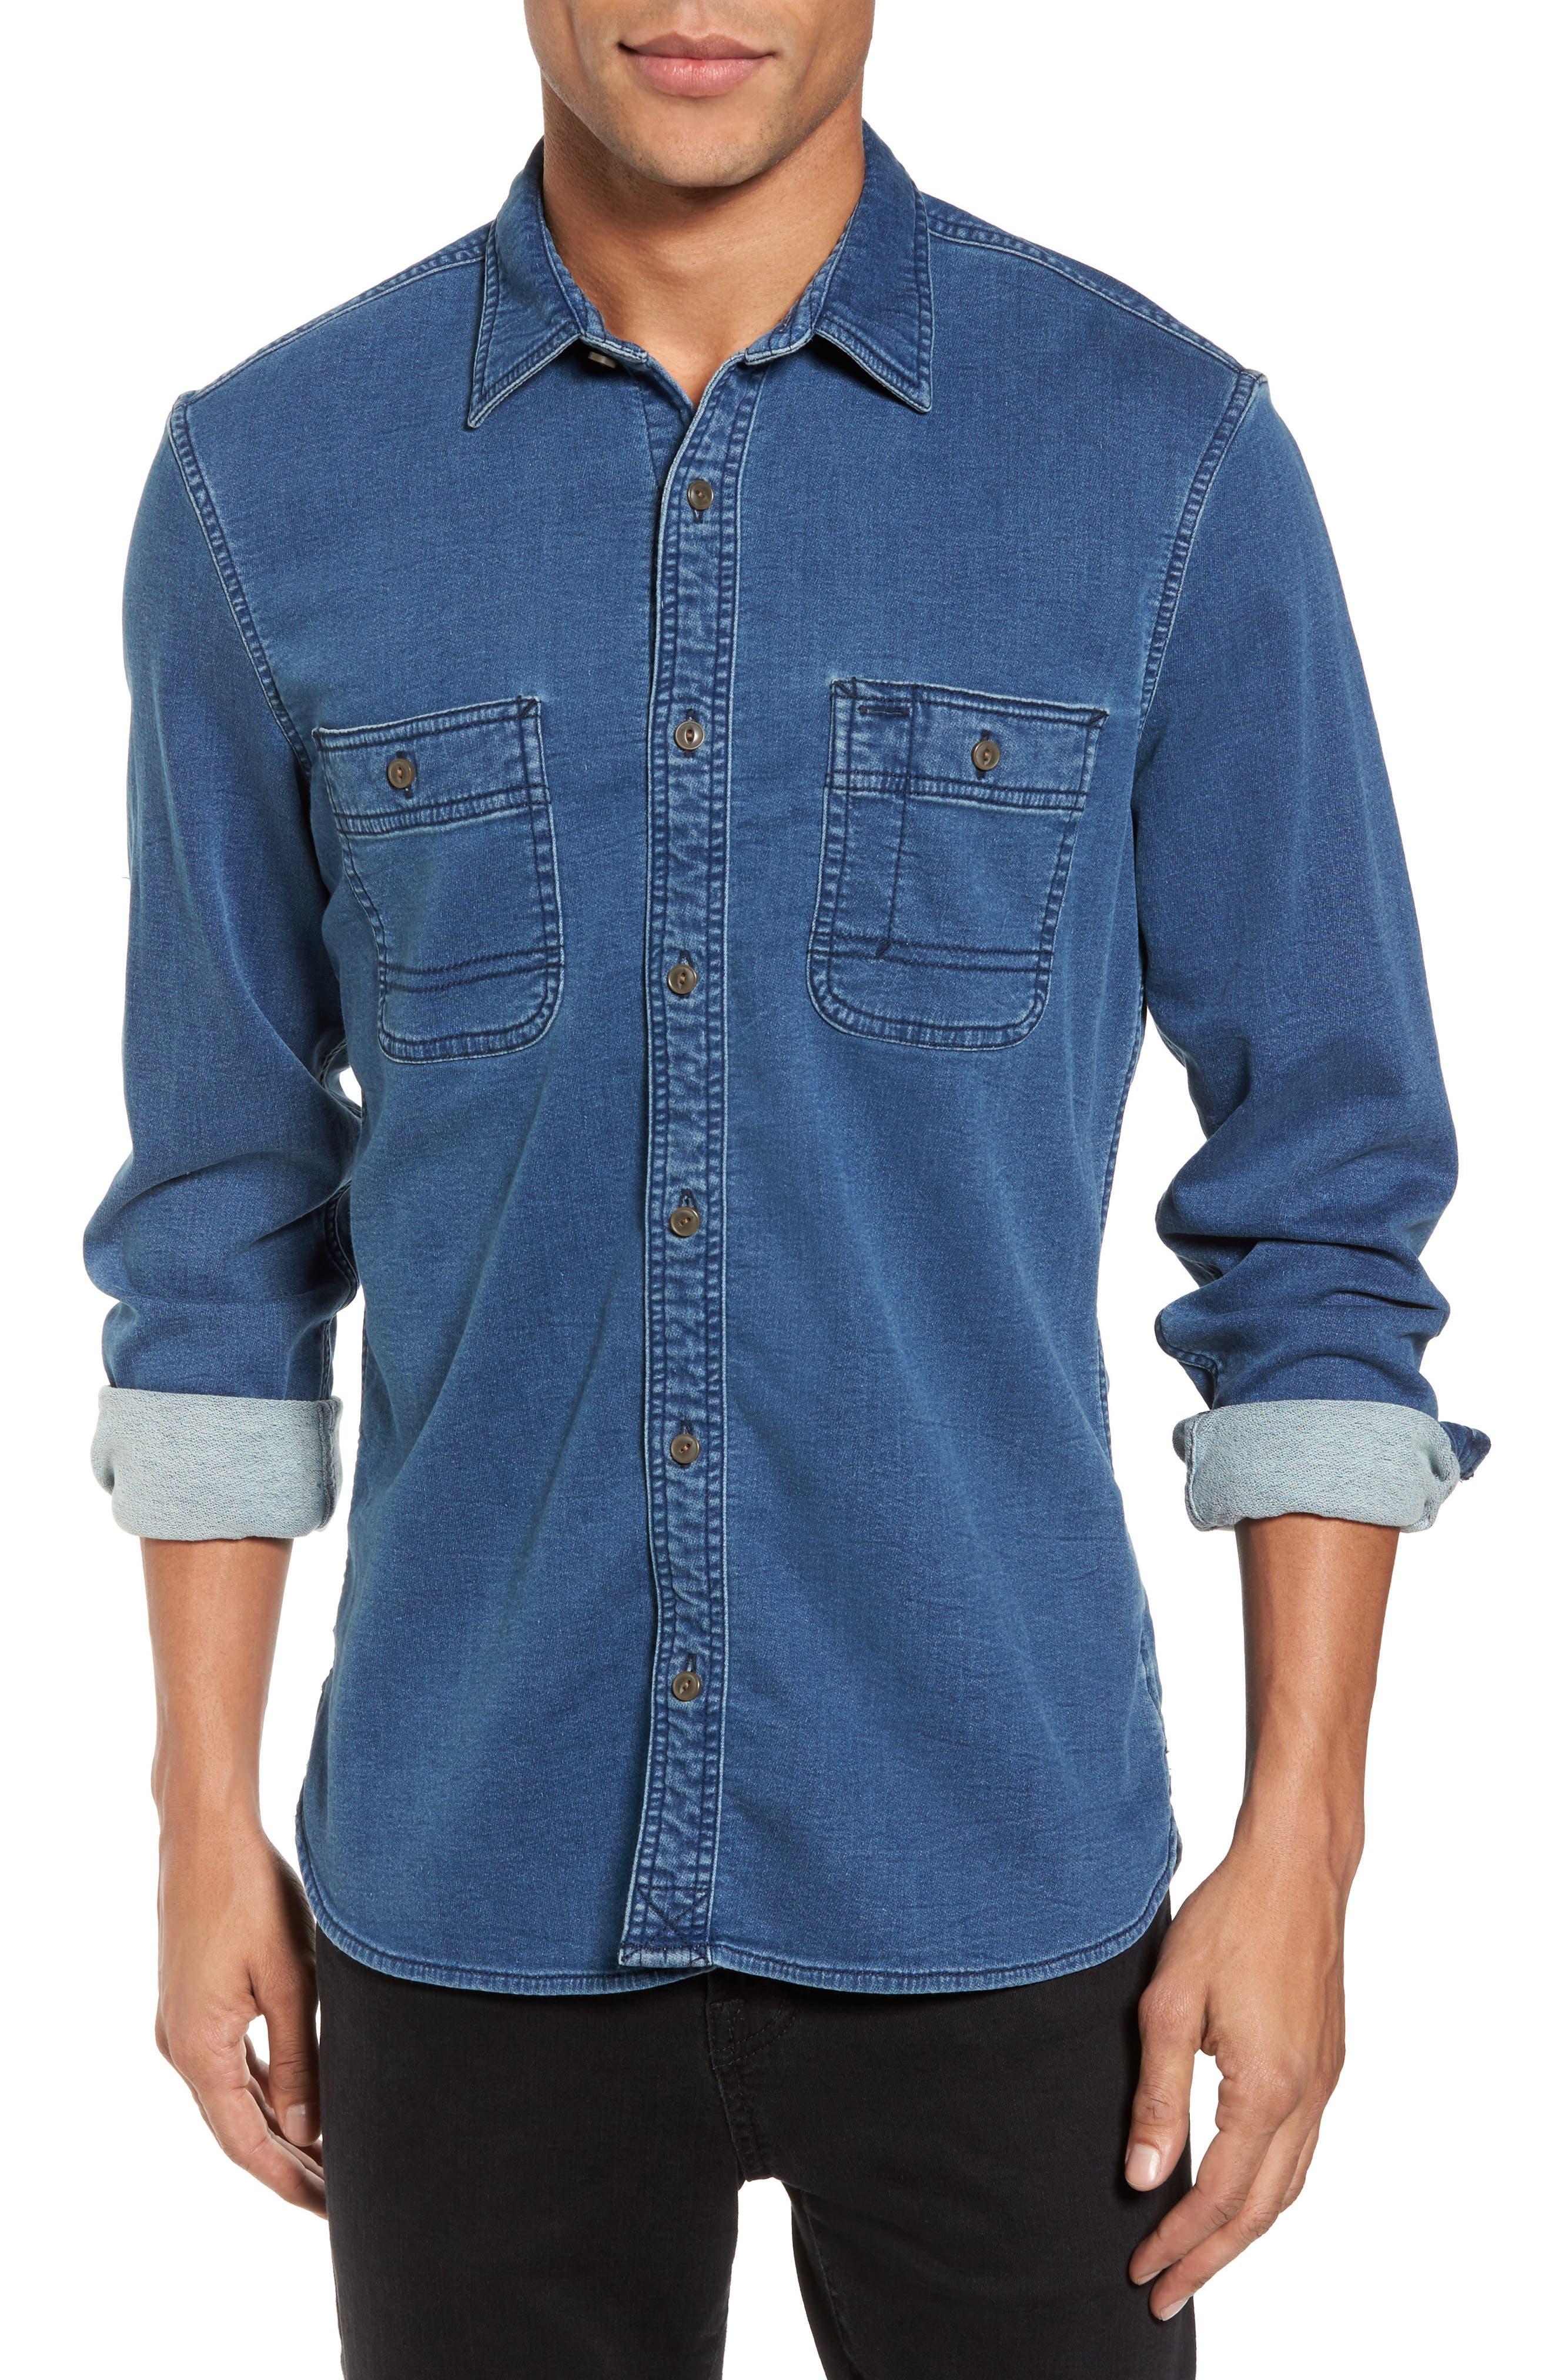 Main Image - Nordstrom Men's Shop Trim Fit Utility Wash Knit Denim Shirt